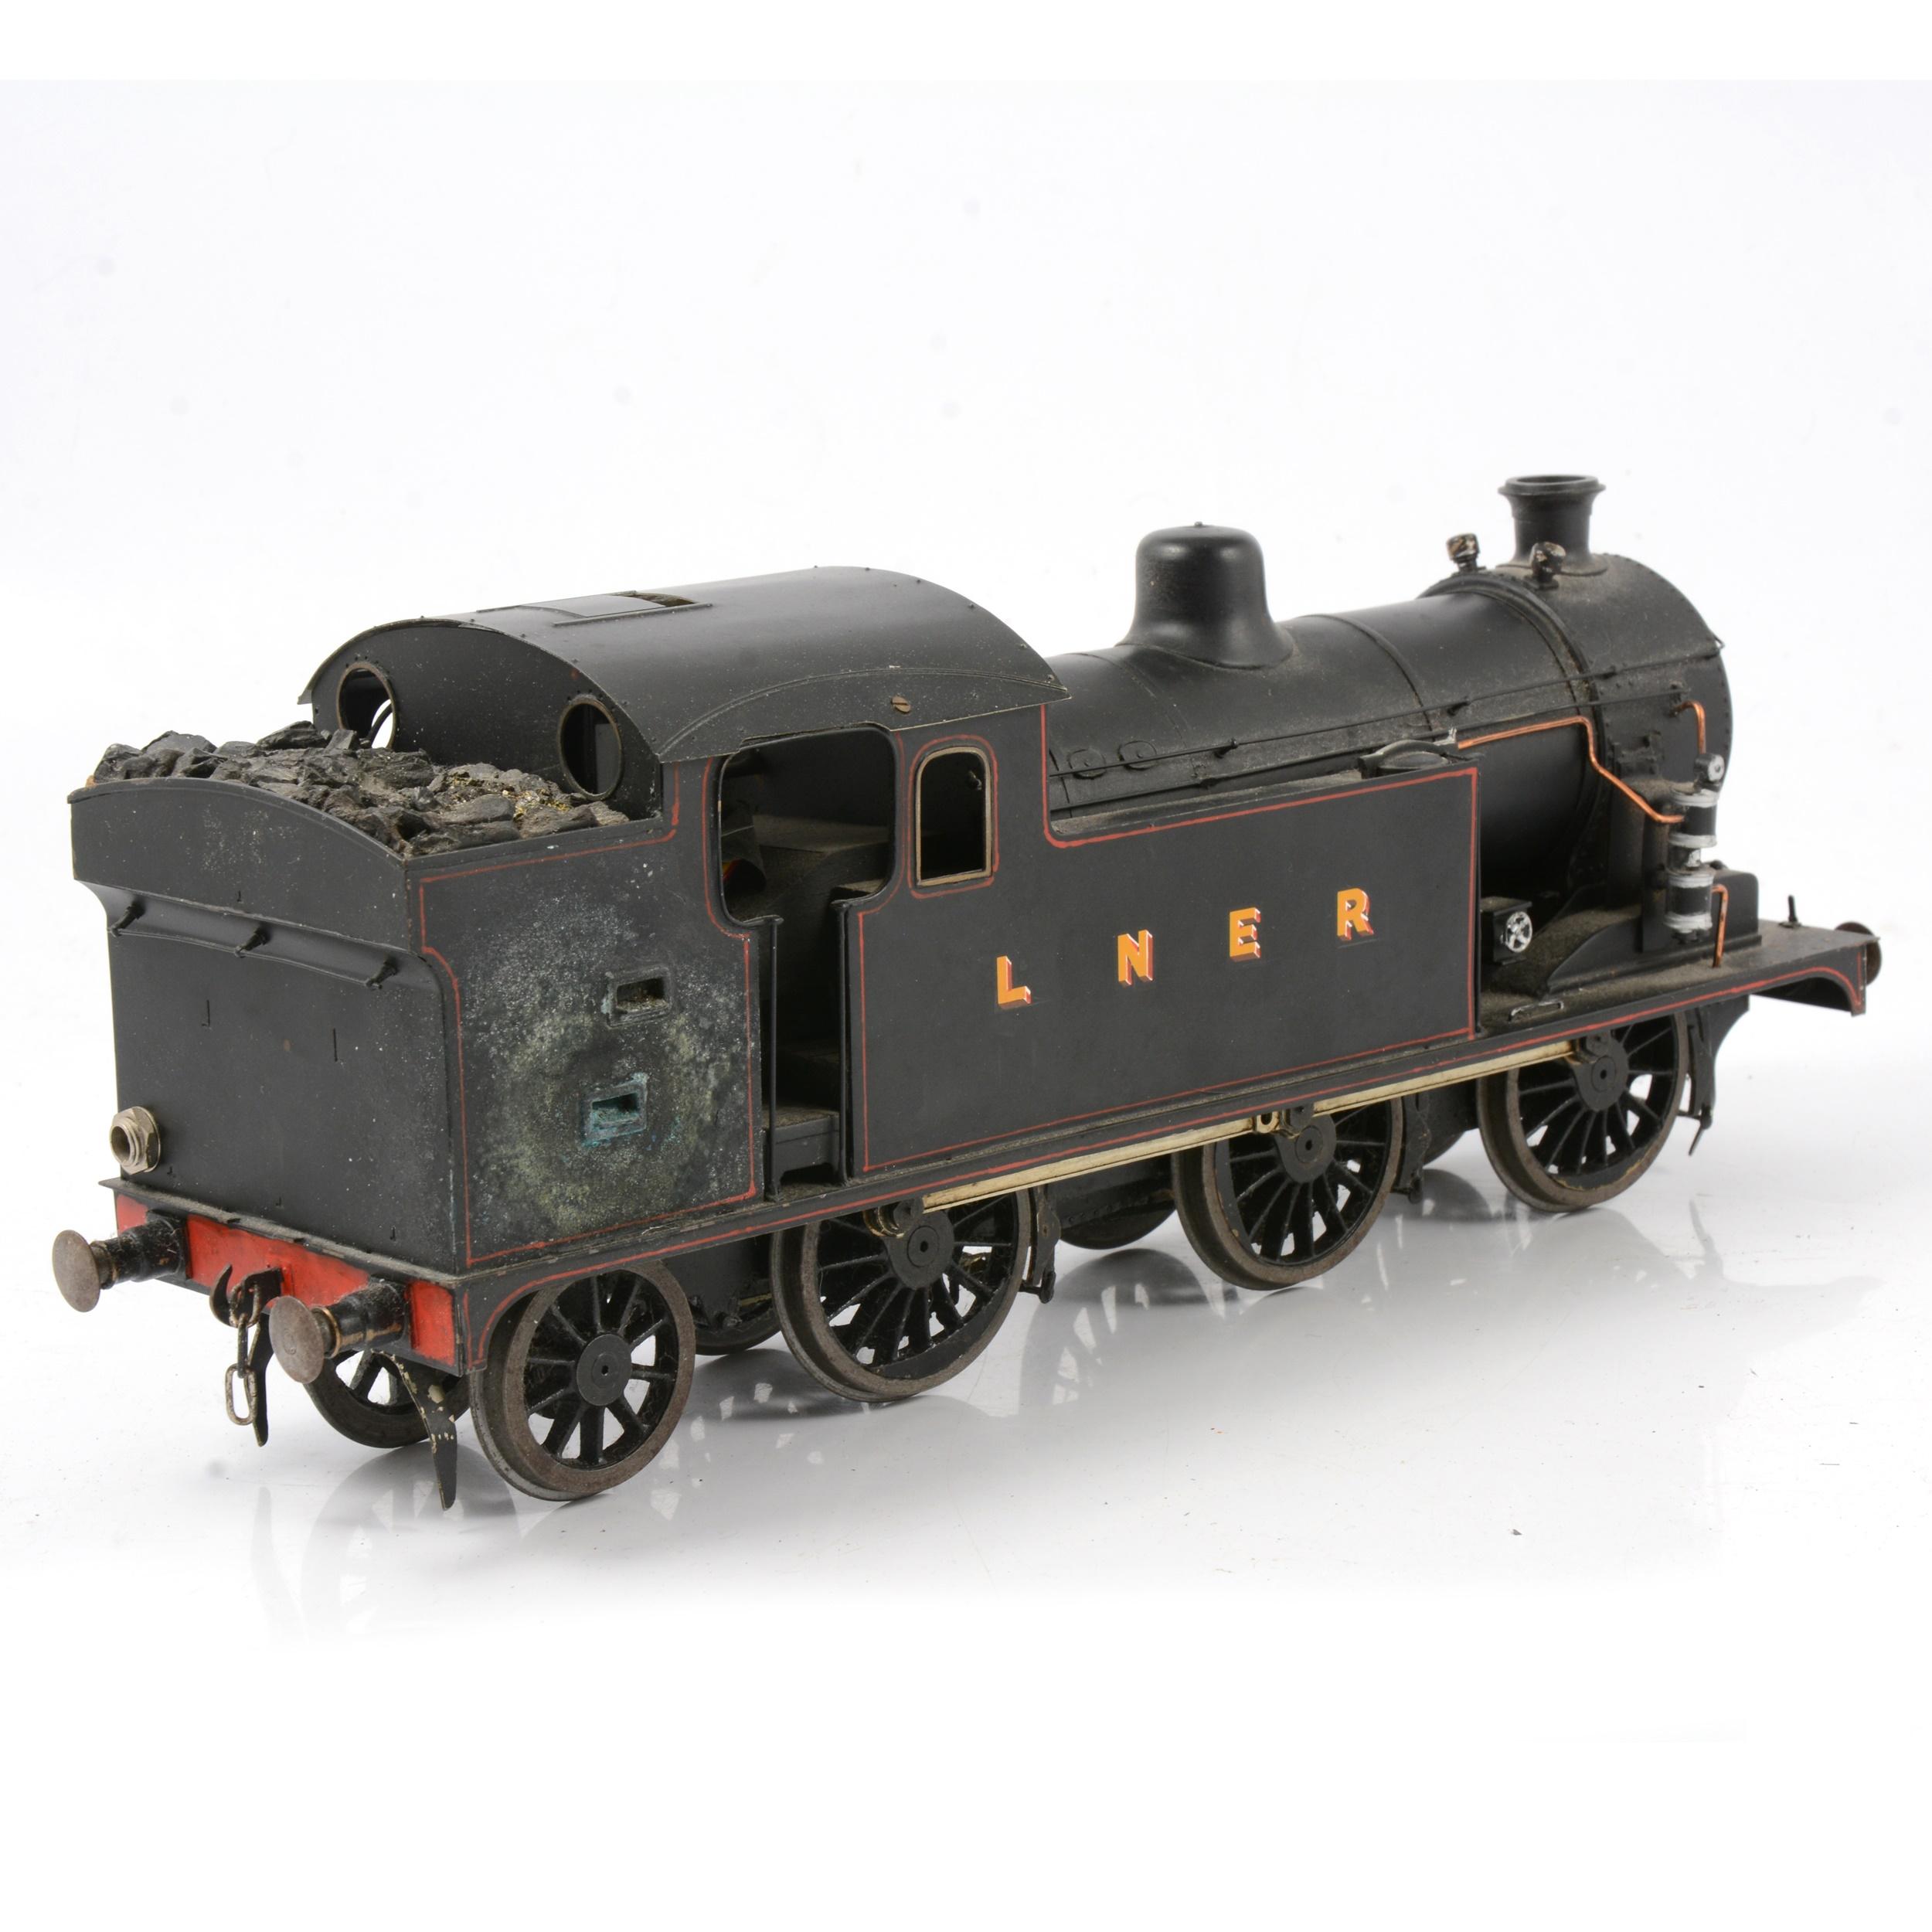 A well-built electric gauge 1 / G scale, 45mm locomotive, LNER 0-6-2 tank engine - Image 2 of 4